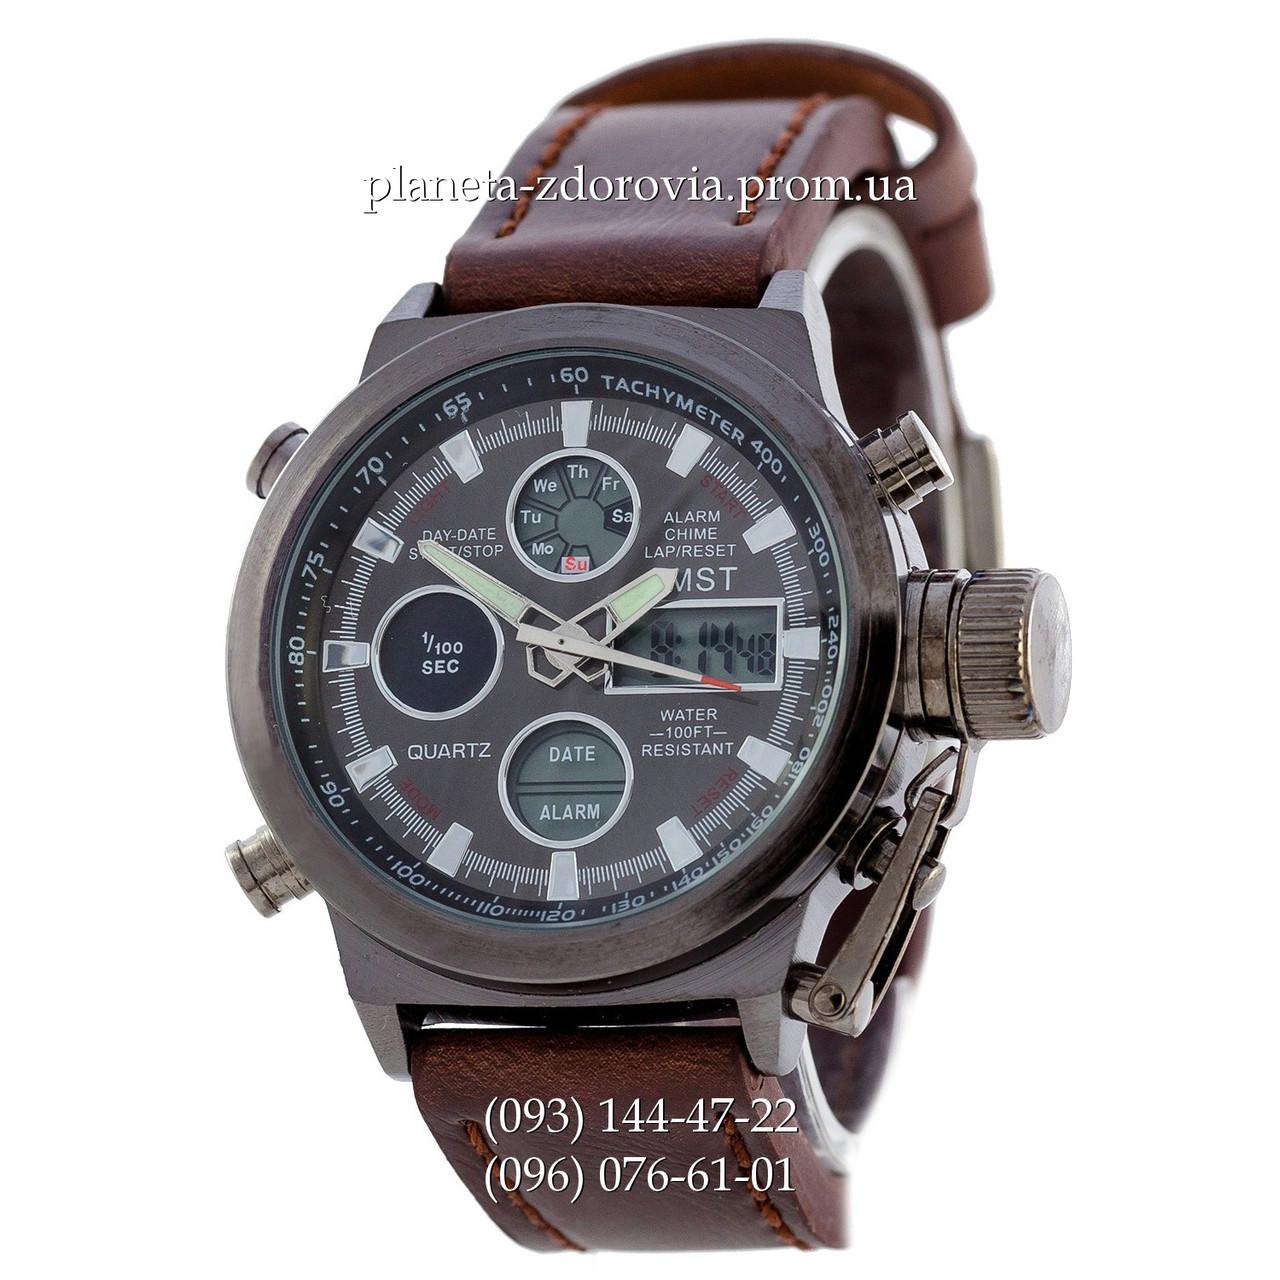 ab1e3c95b6a2 Армейские наручные часы AMST  AM 3003 silver - Планета здоровья интернет- магазин в Харькове